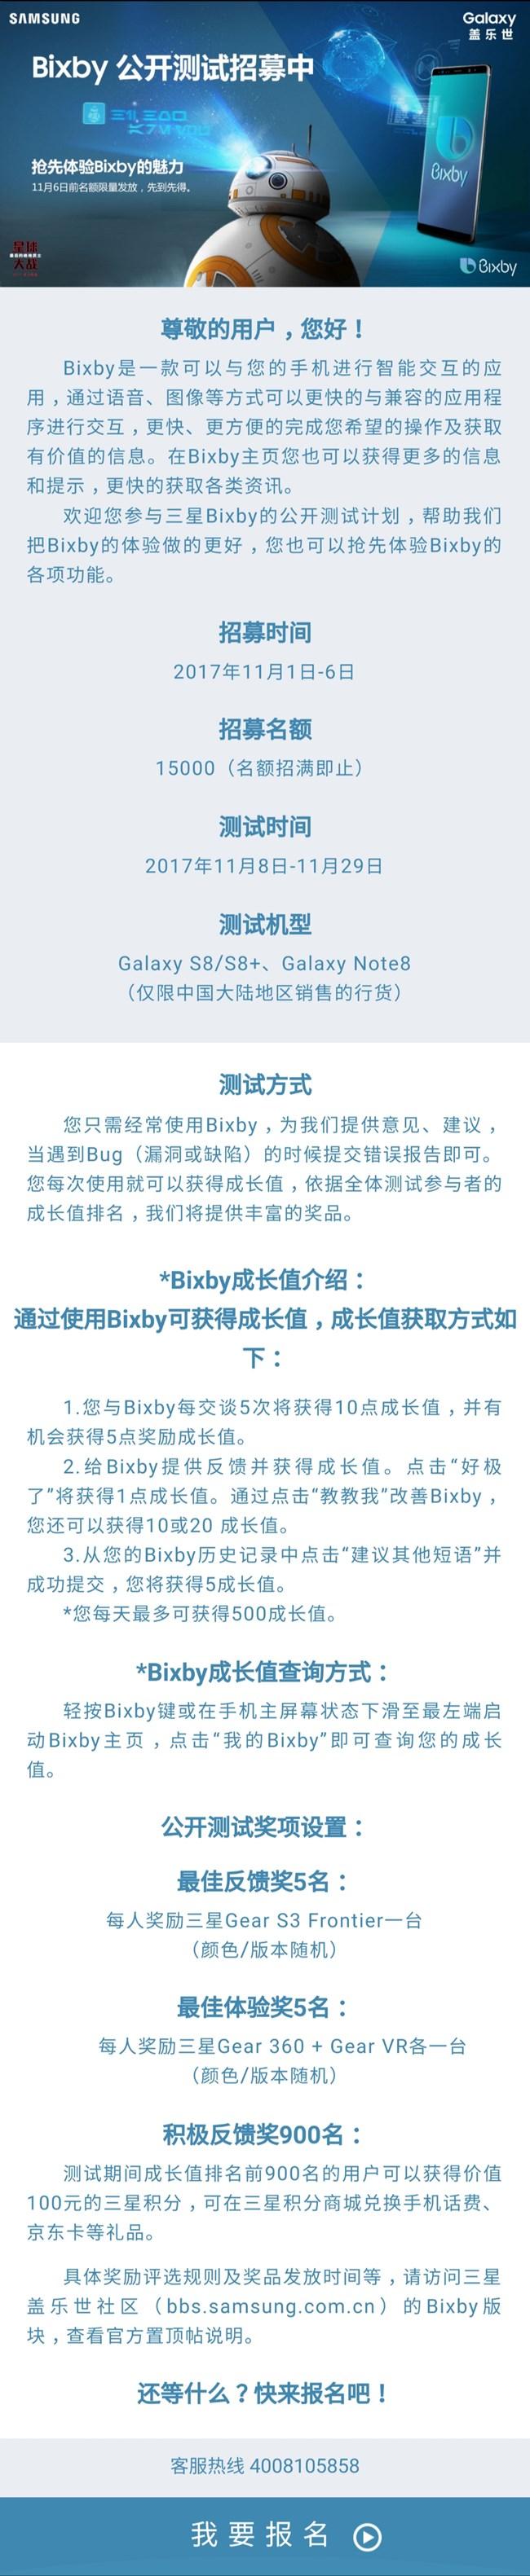 Bixby公开测试招募中 现在报名抢先体验!